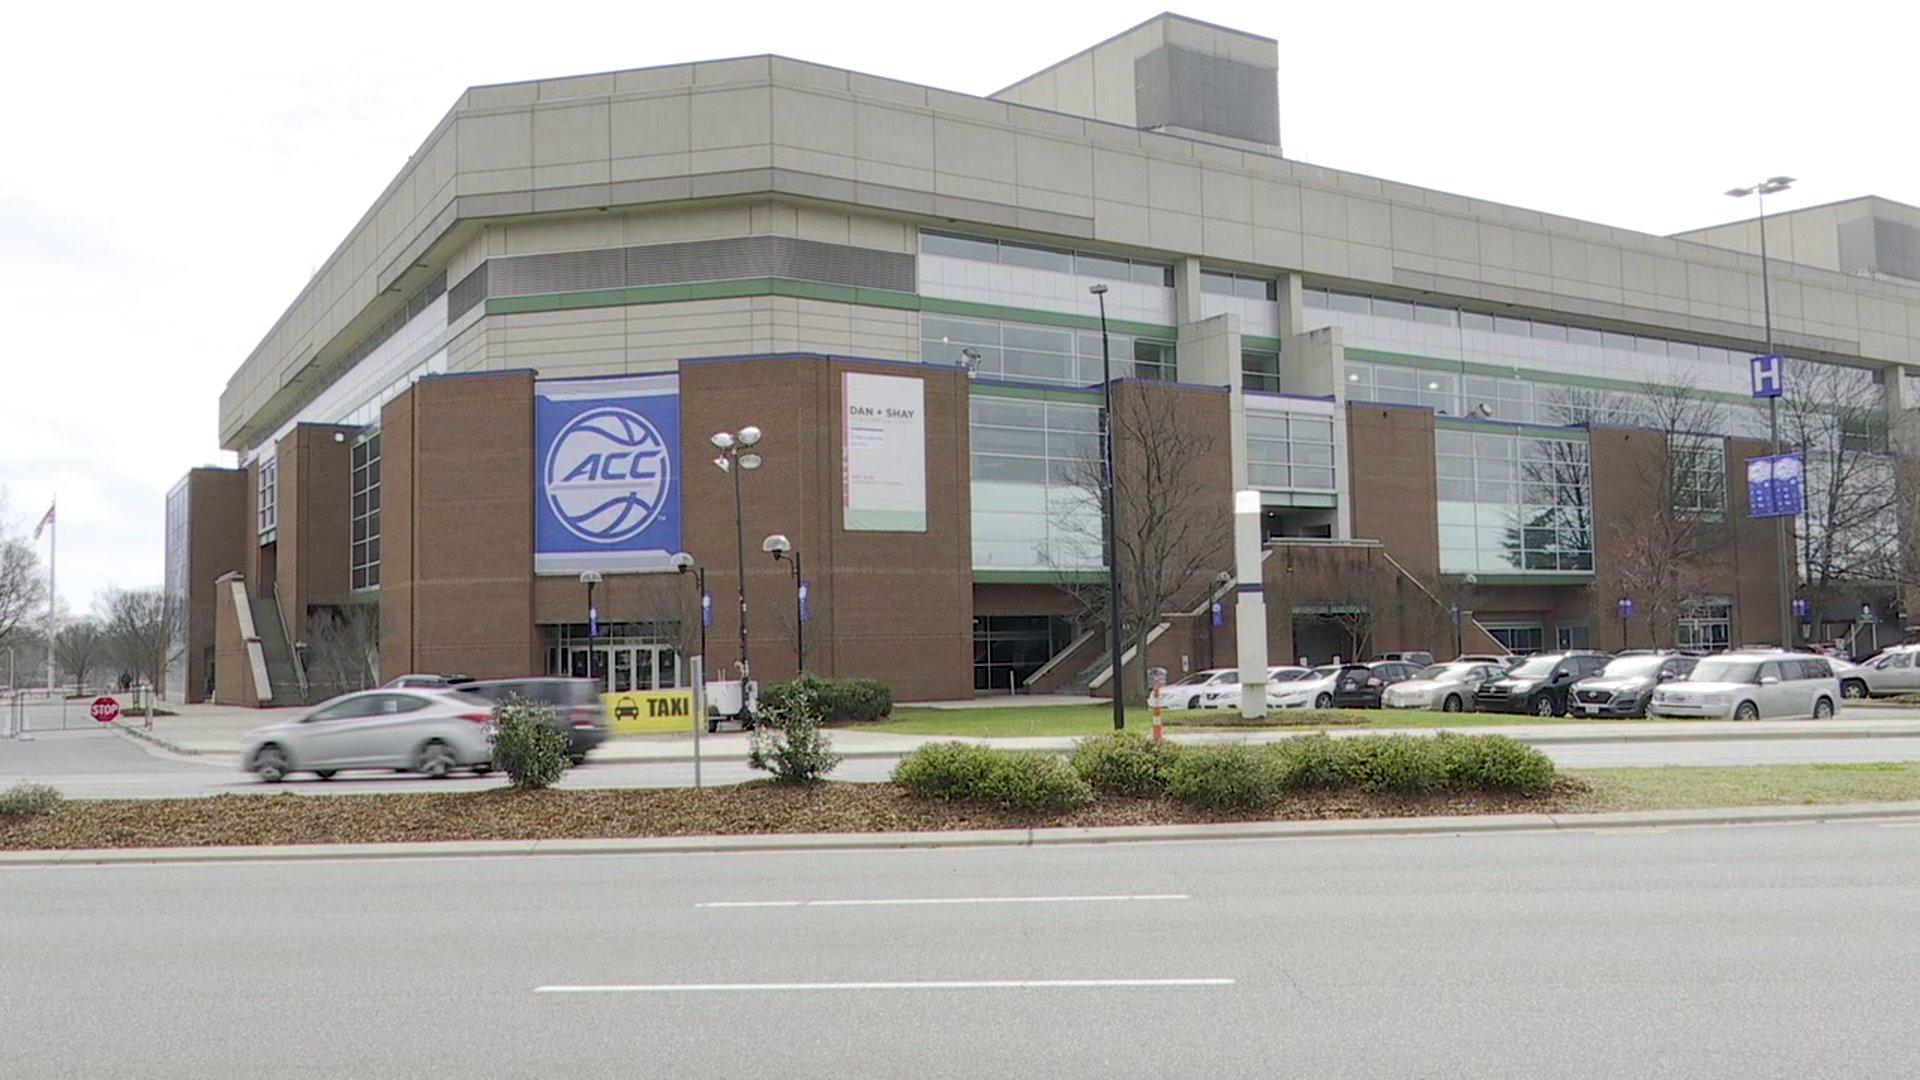 Preparations underway as ACC tournament returns to Greensboro